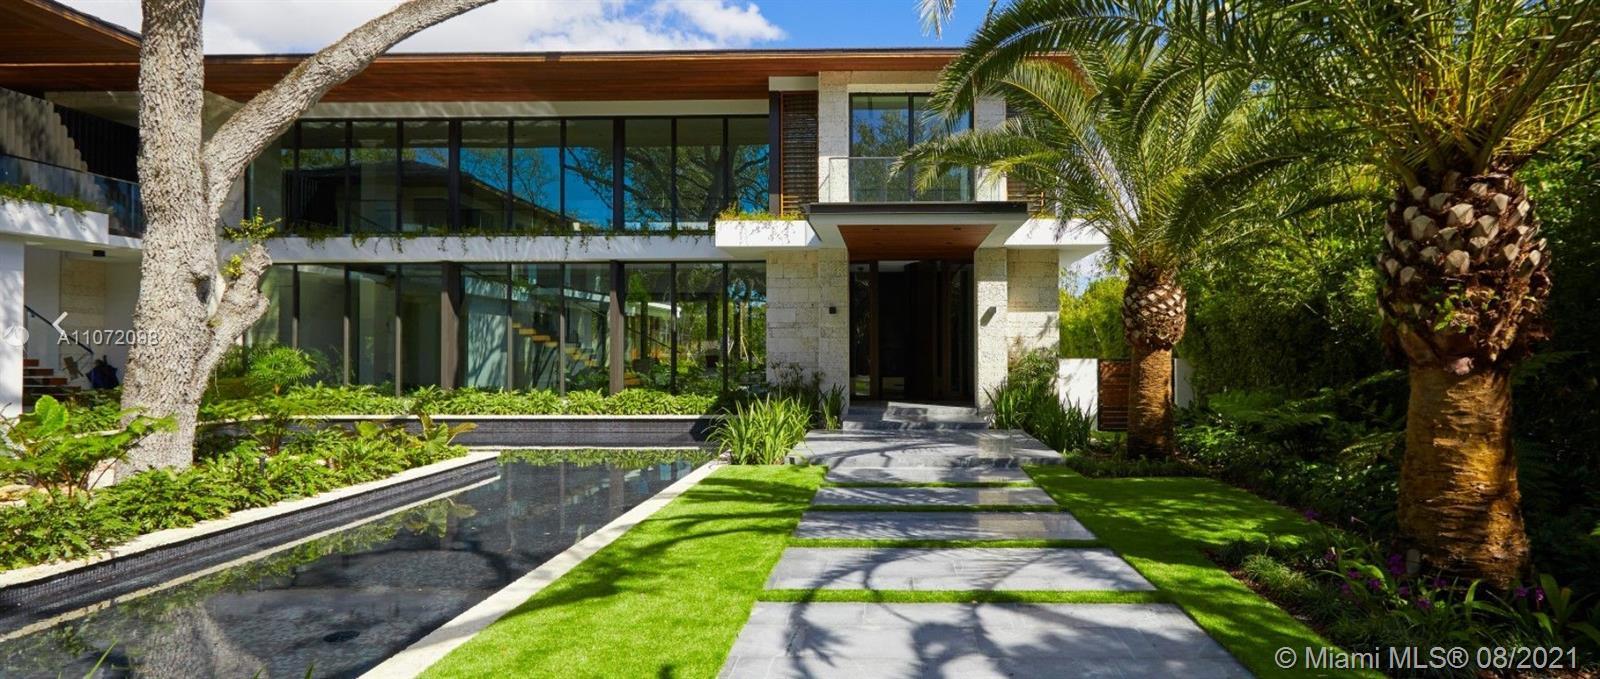 600 HIBISCUS LANE, Miami, Florida 33137